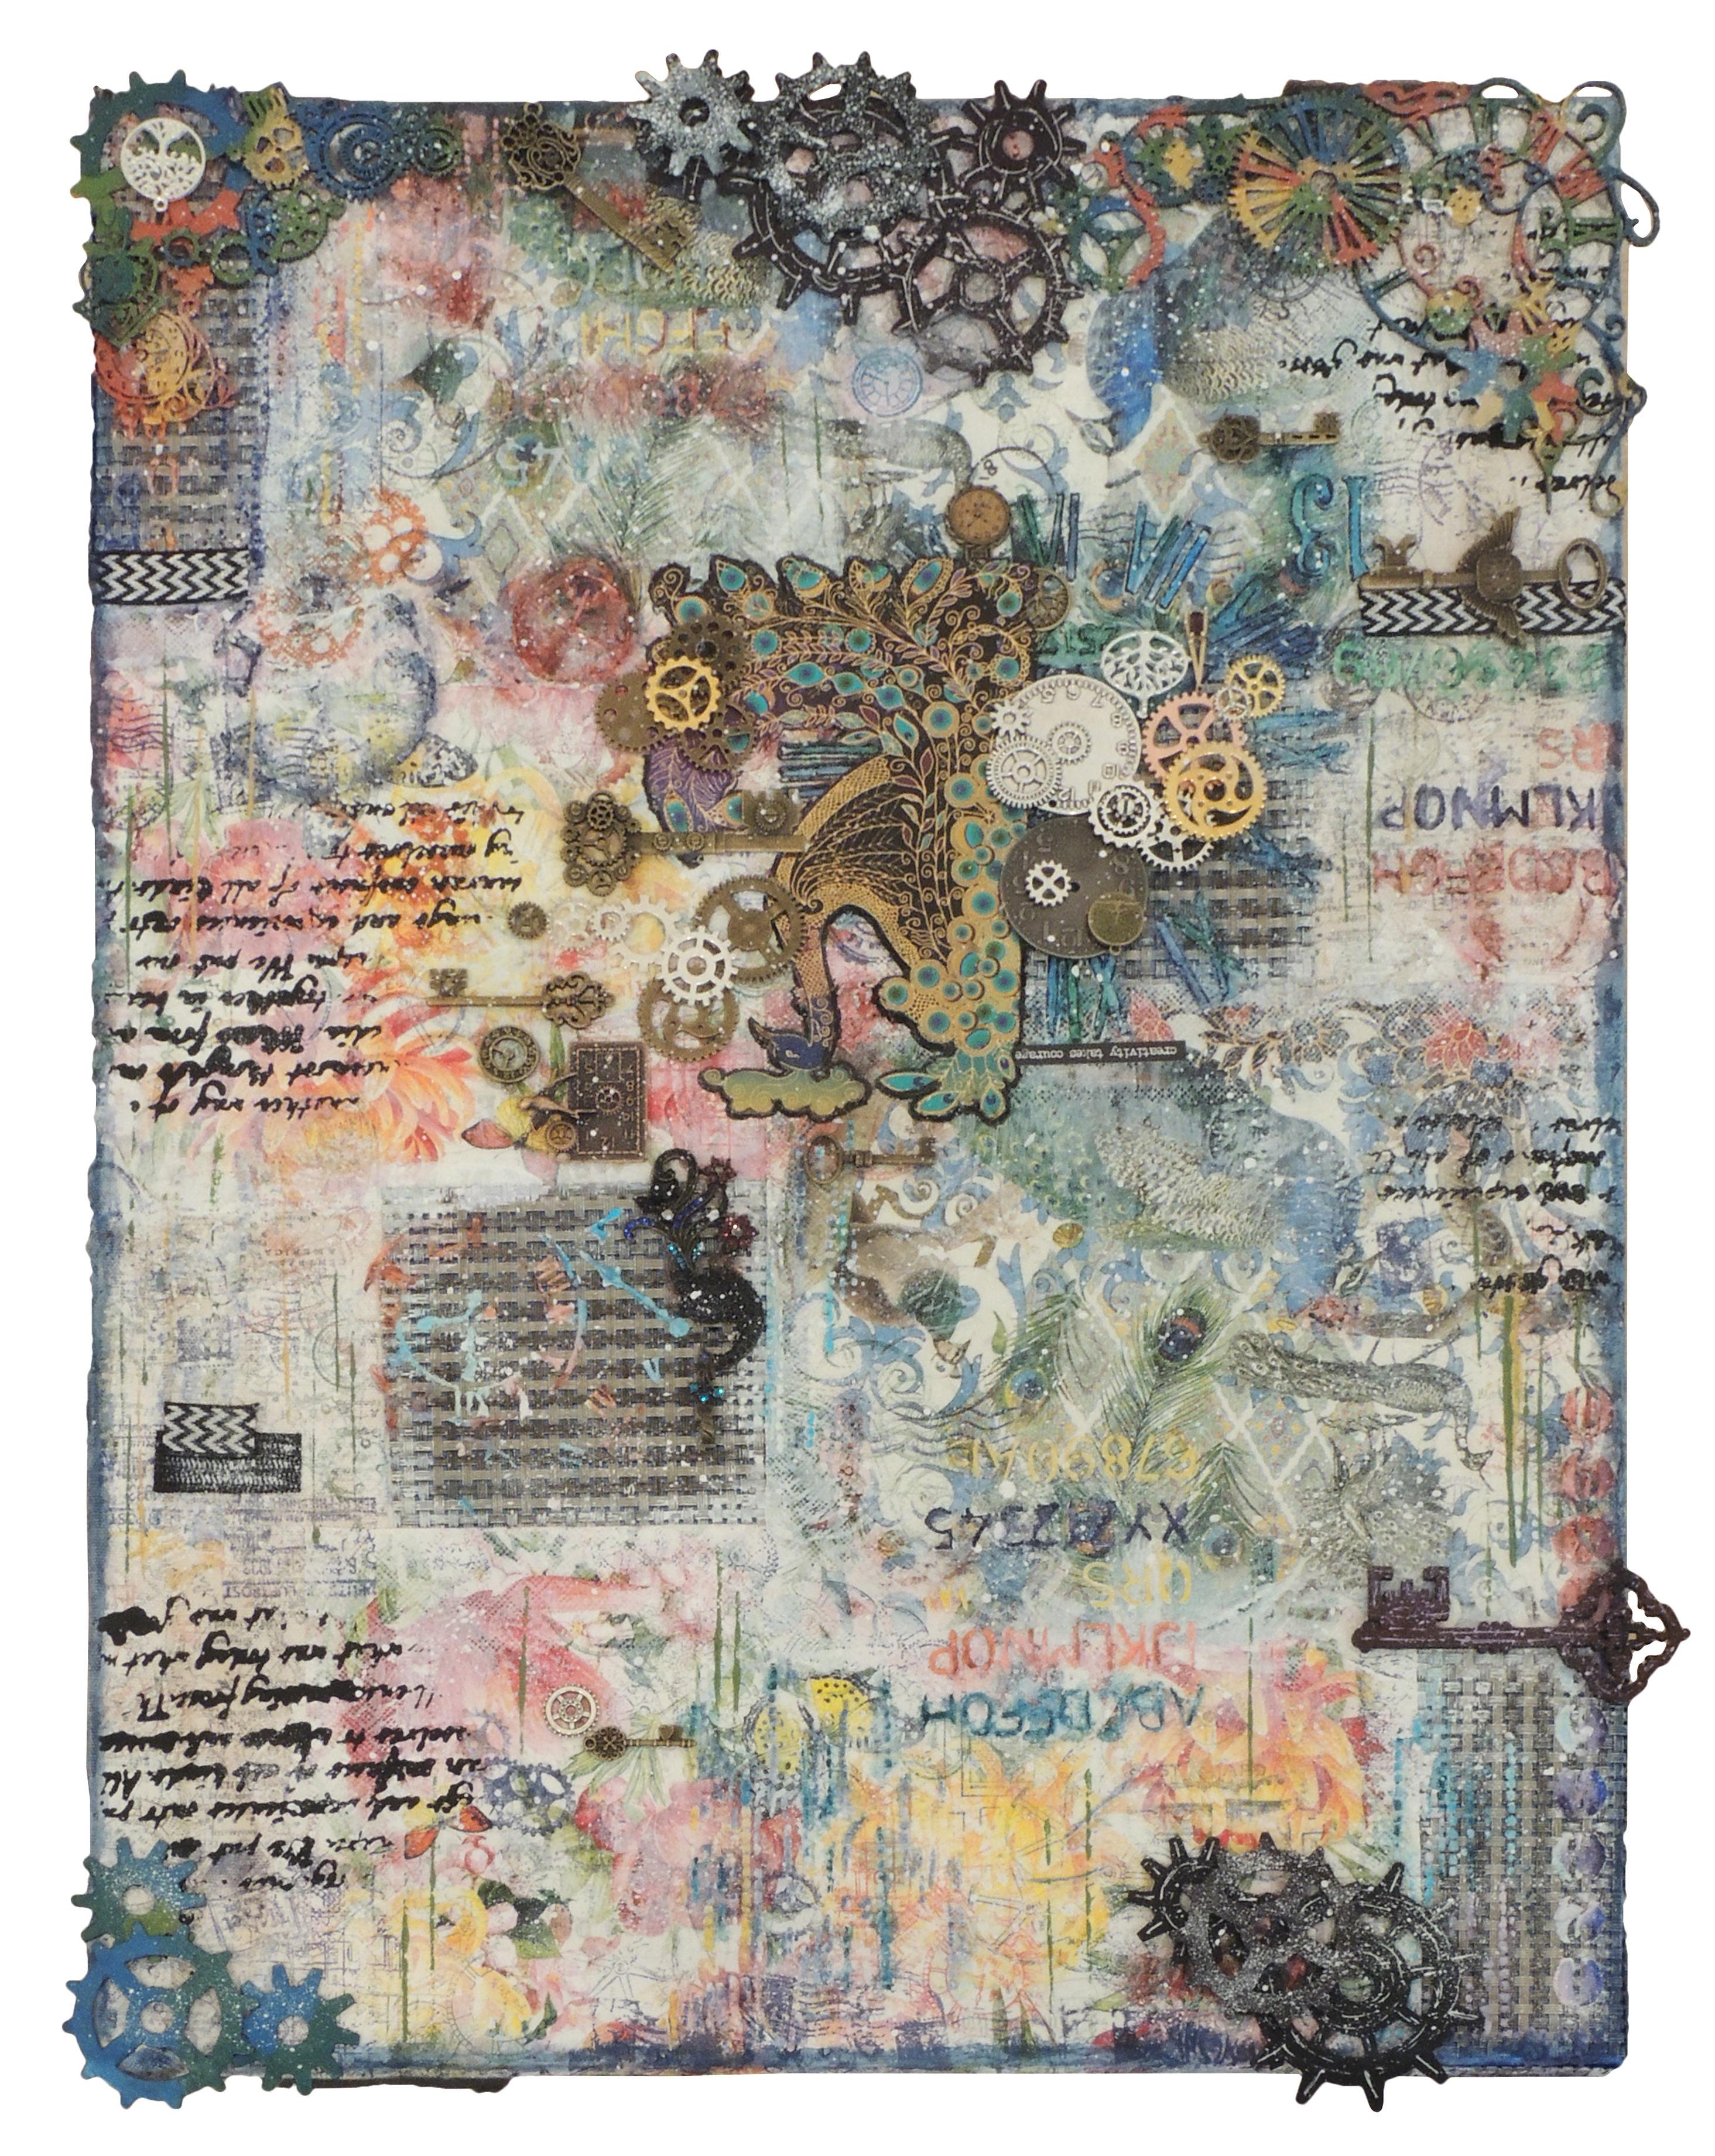 Jennifer Tritle | CREATIVITY TAKES COURAGE | Mixed media